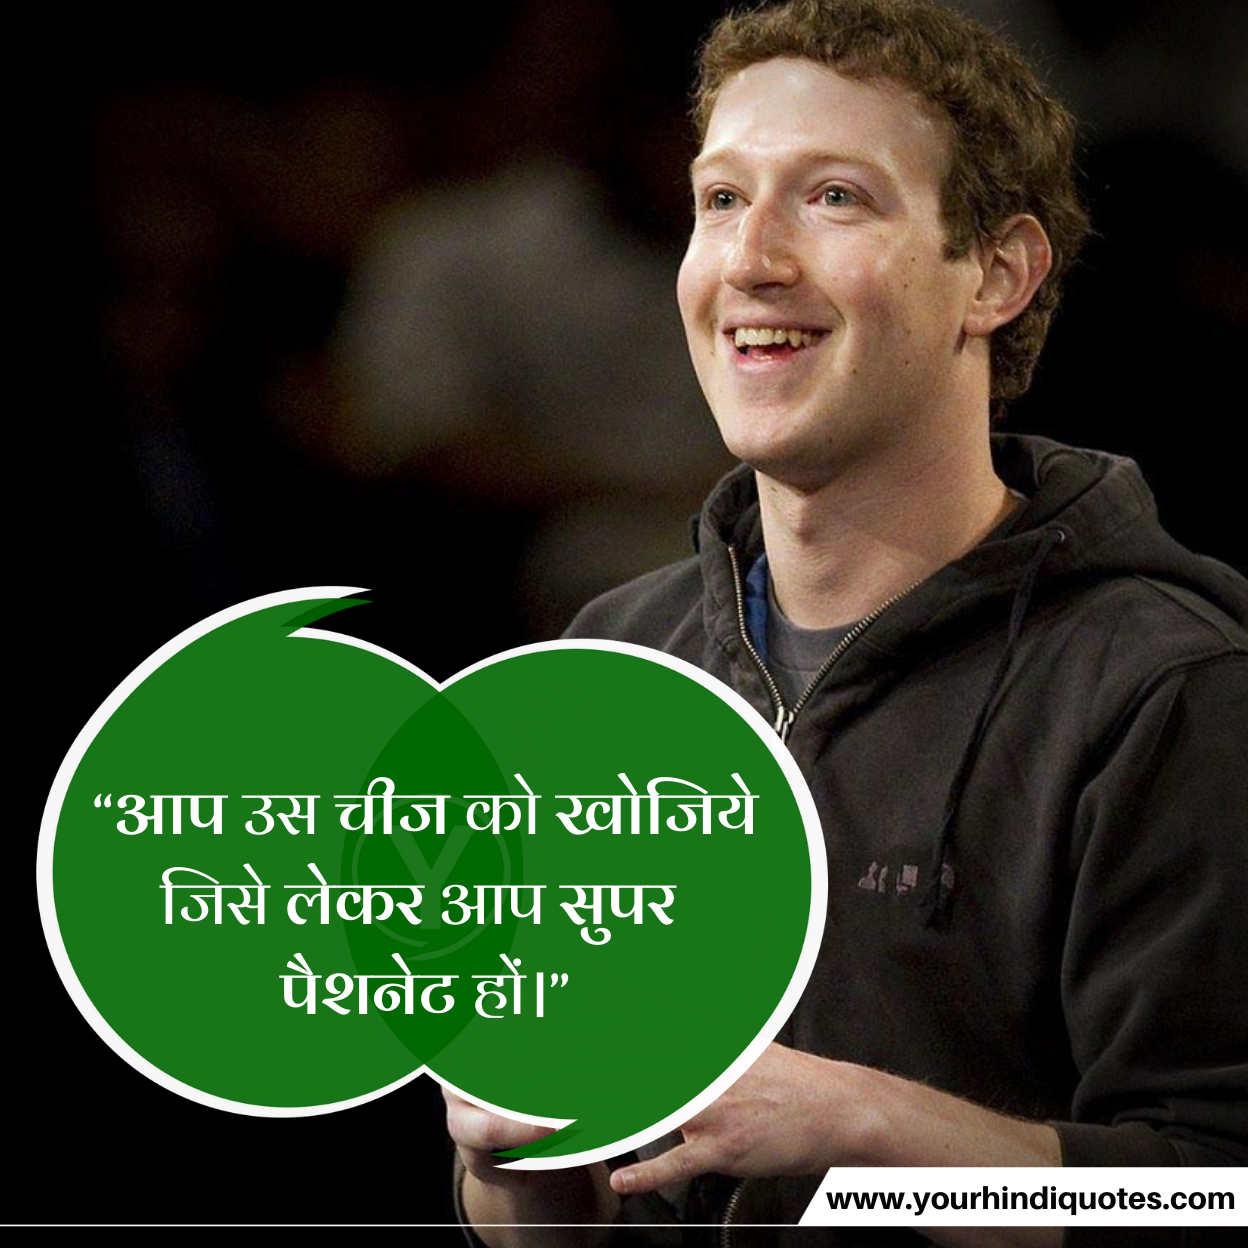 Mark Zuckerberg Quotes Image